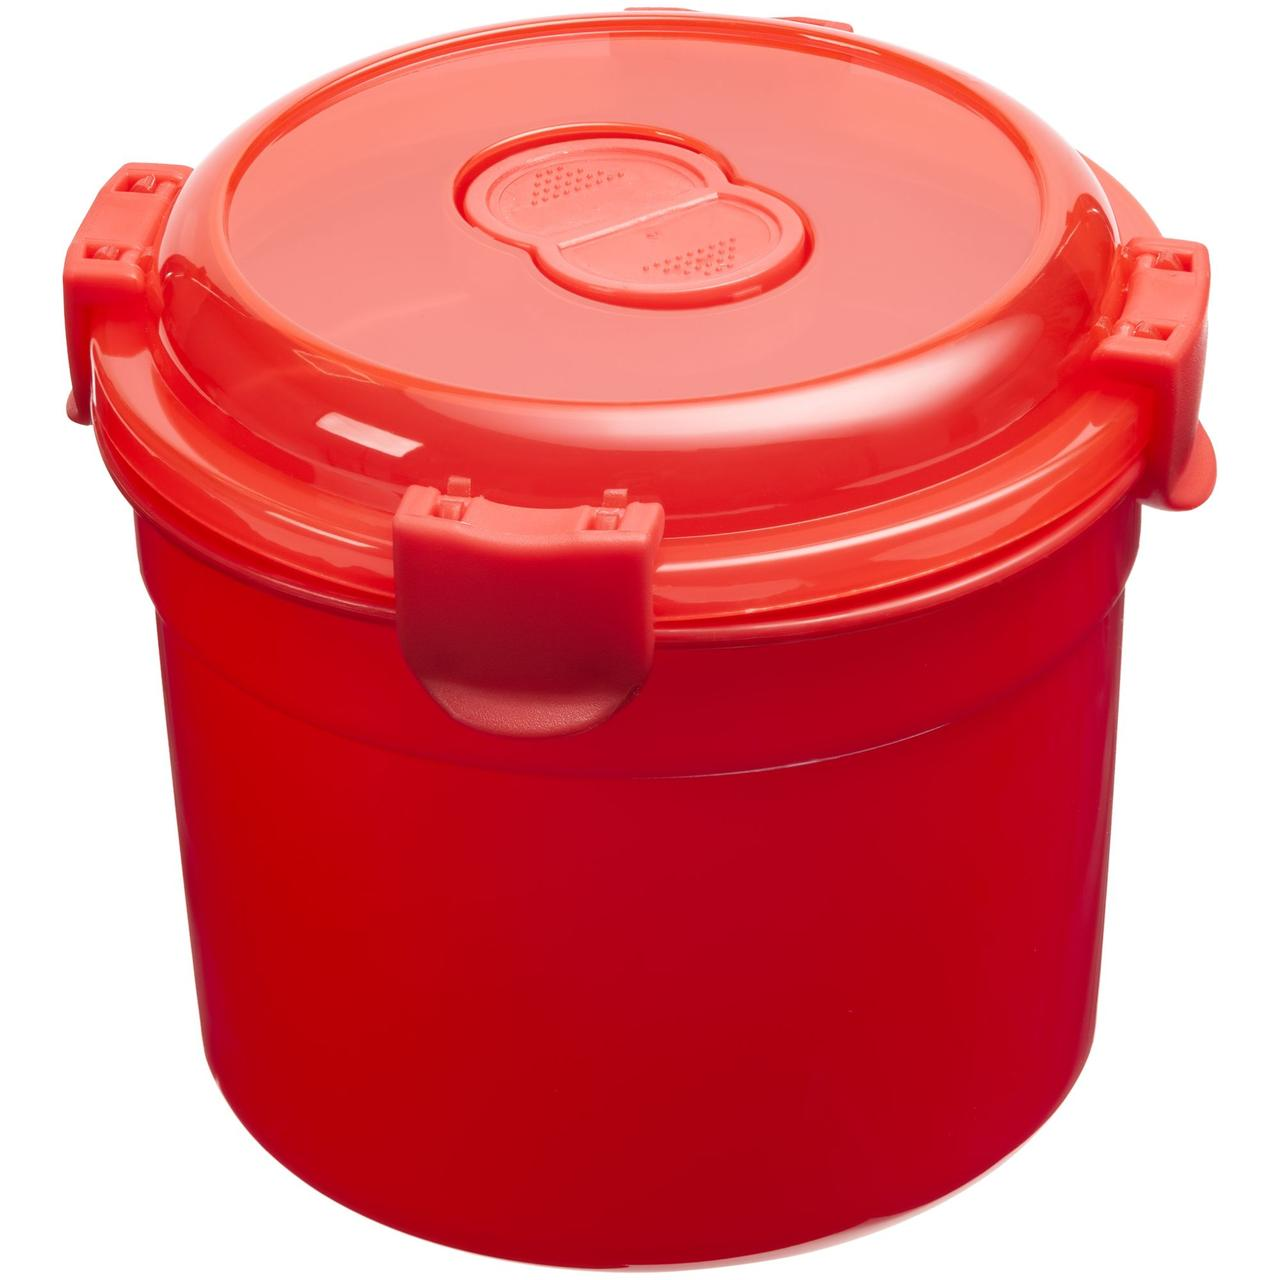 Ланчбокс Barrel Roll, красный (артикул 10173.50)